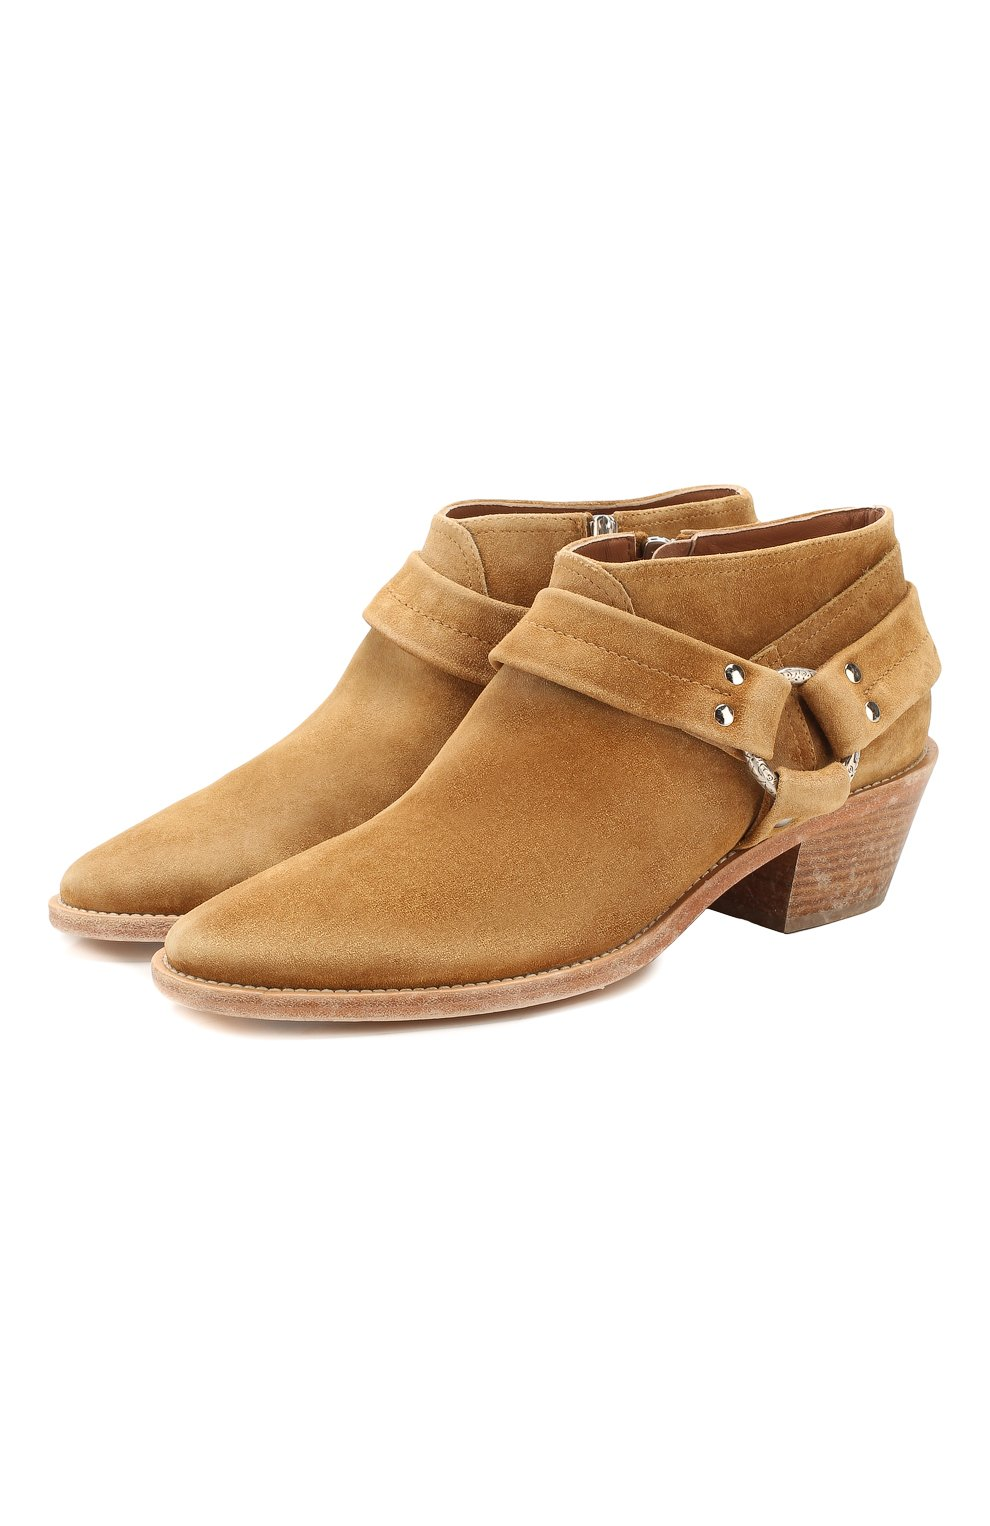 Женские замшевые ботинки bretagne GOLDEN GOOSE DELUXE BRAND коричневого цвета, арт. G36WS739.A2   Фото 1